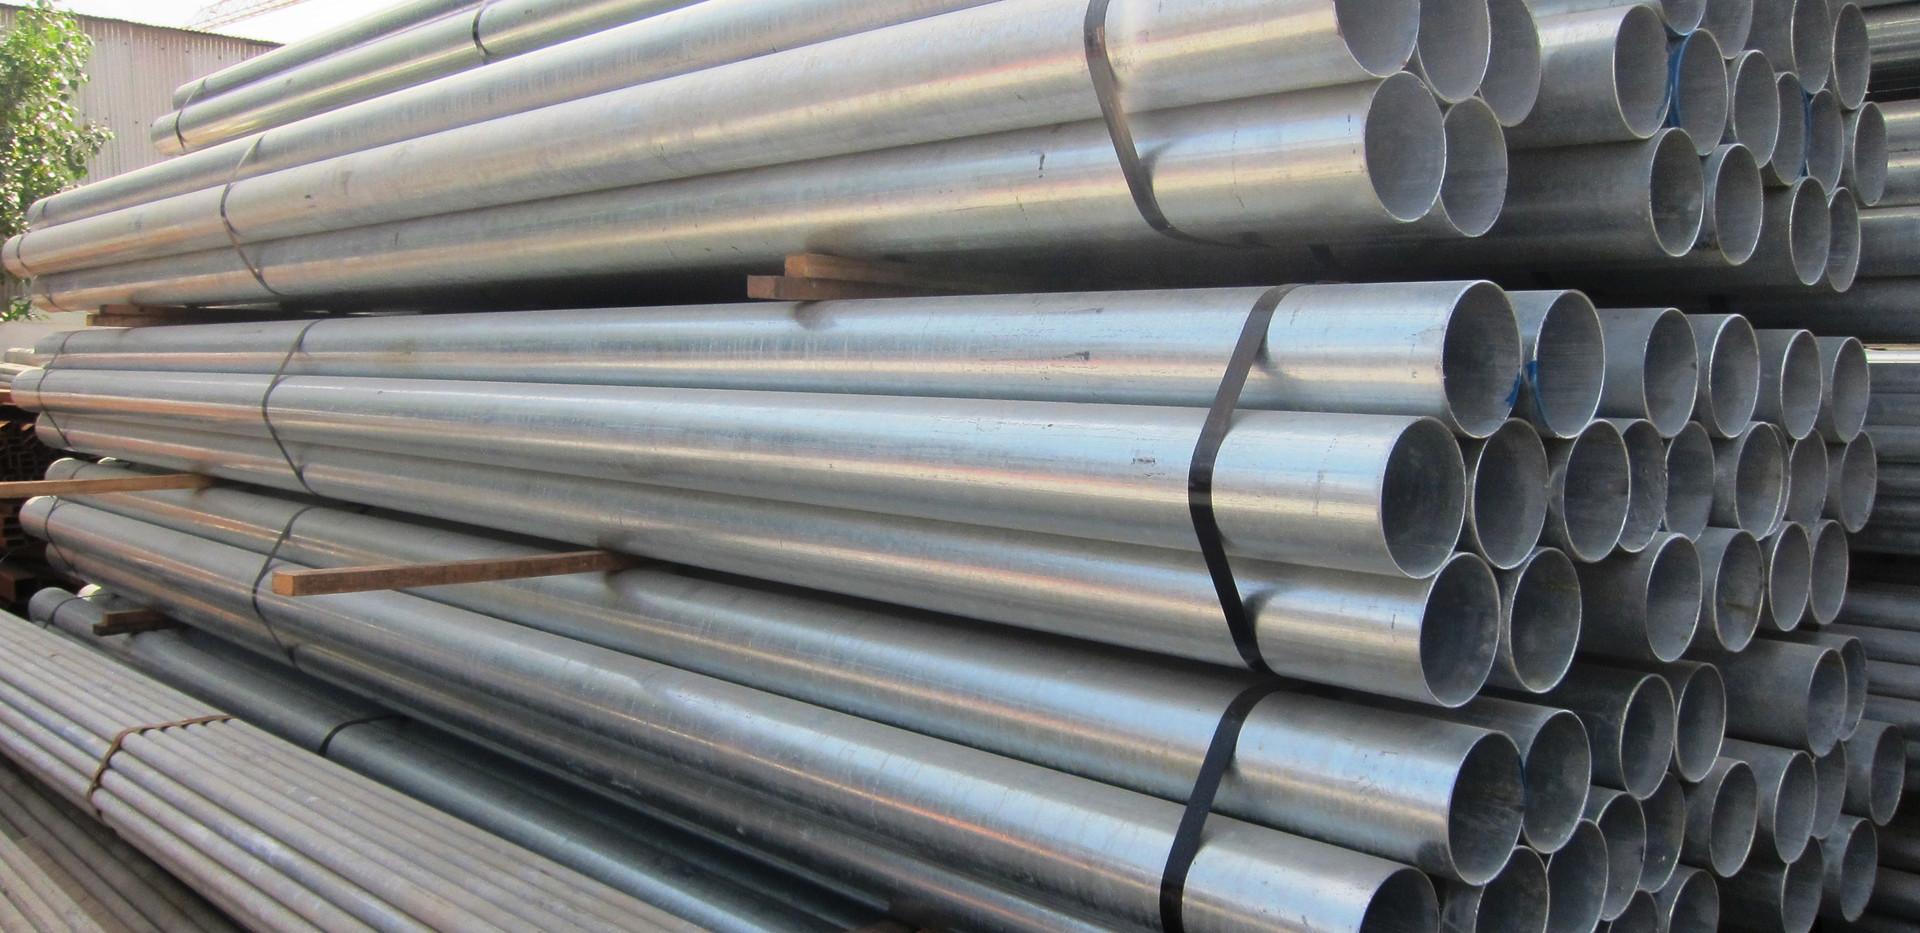 Galvanized Plain End Pipes